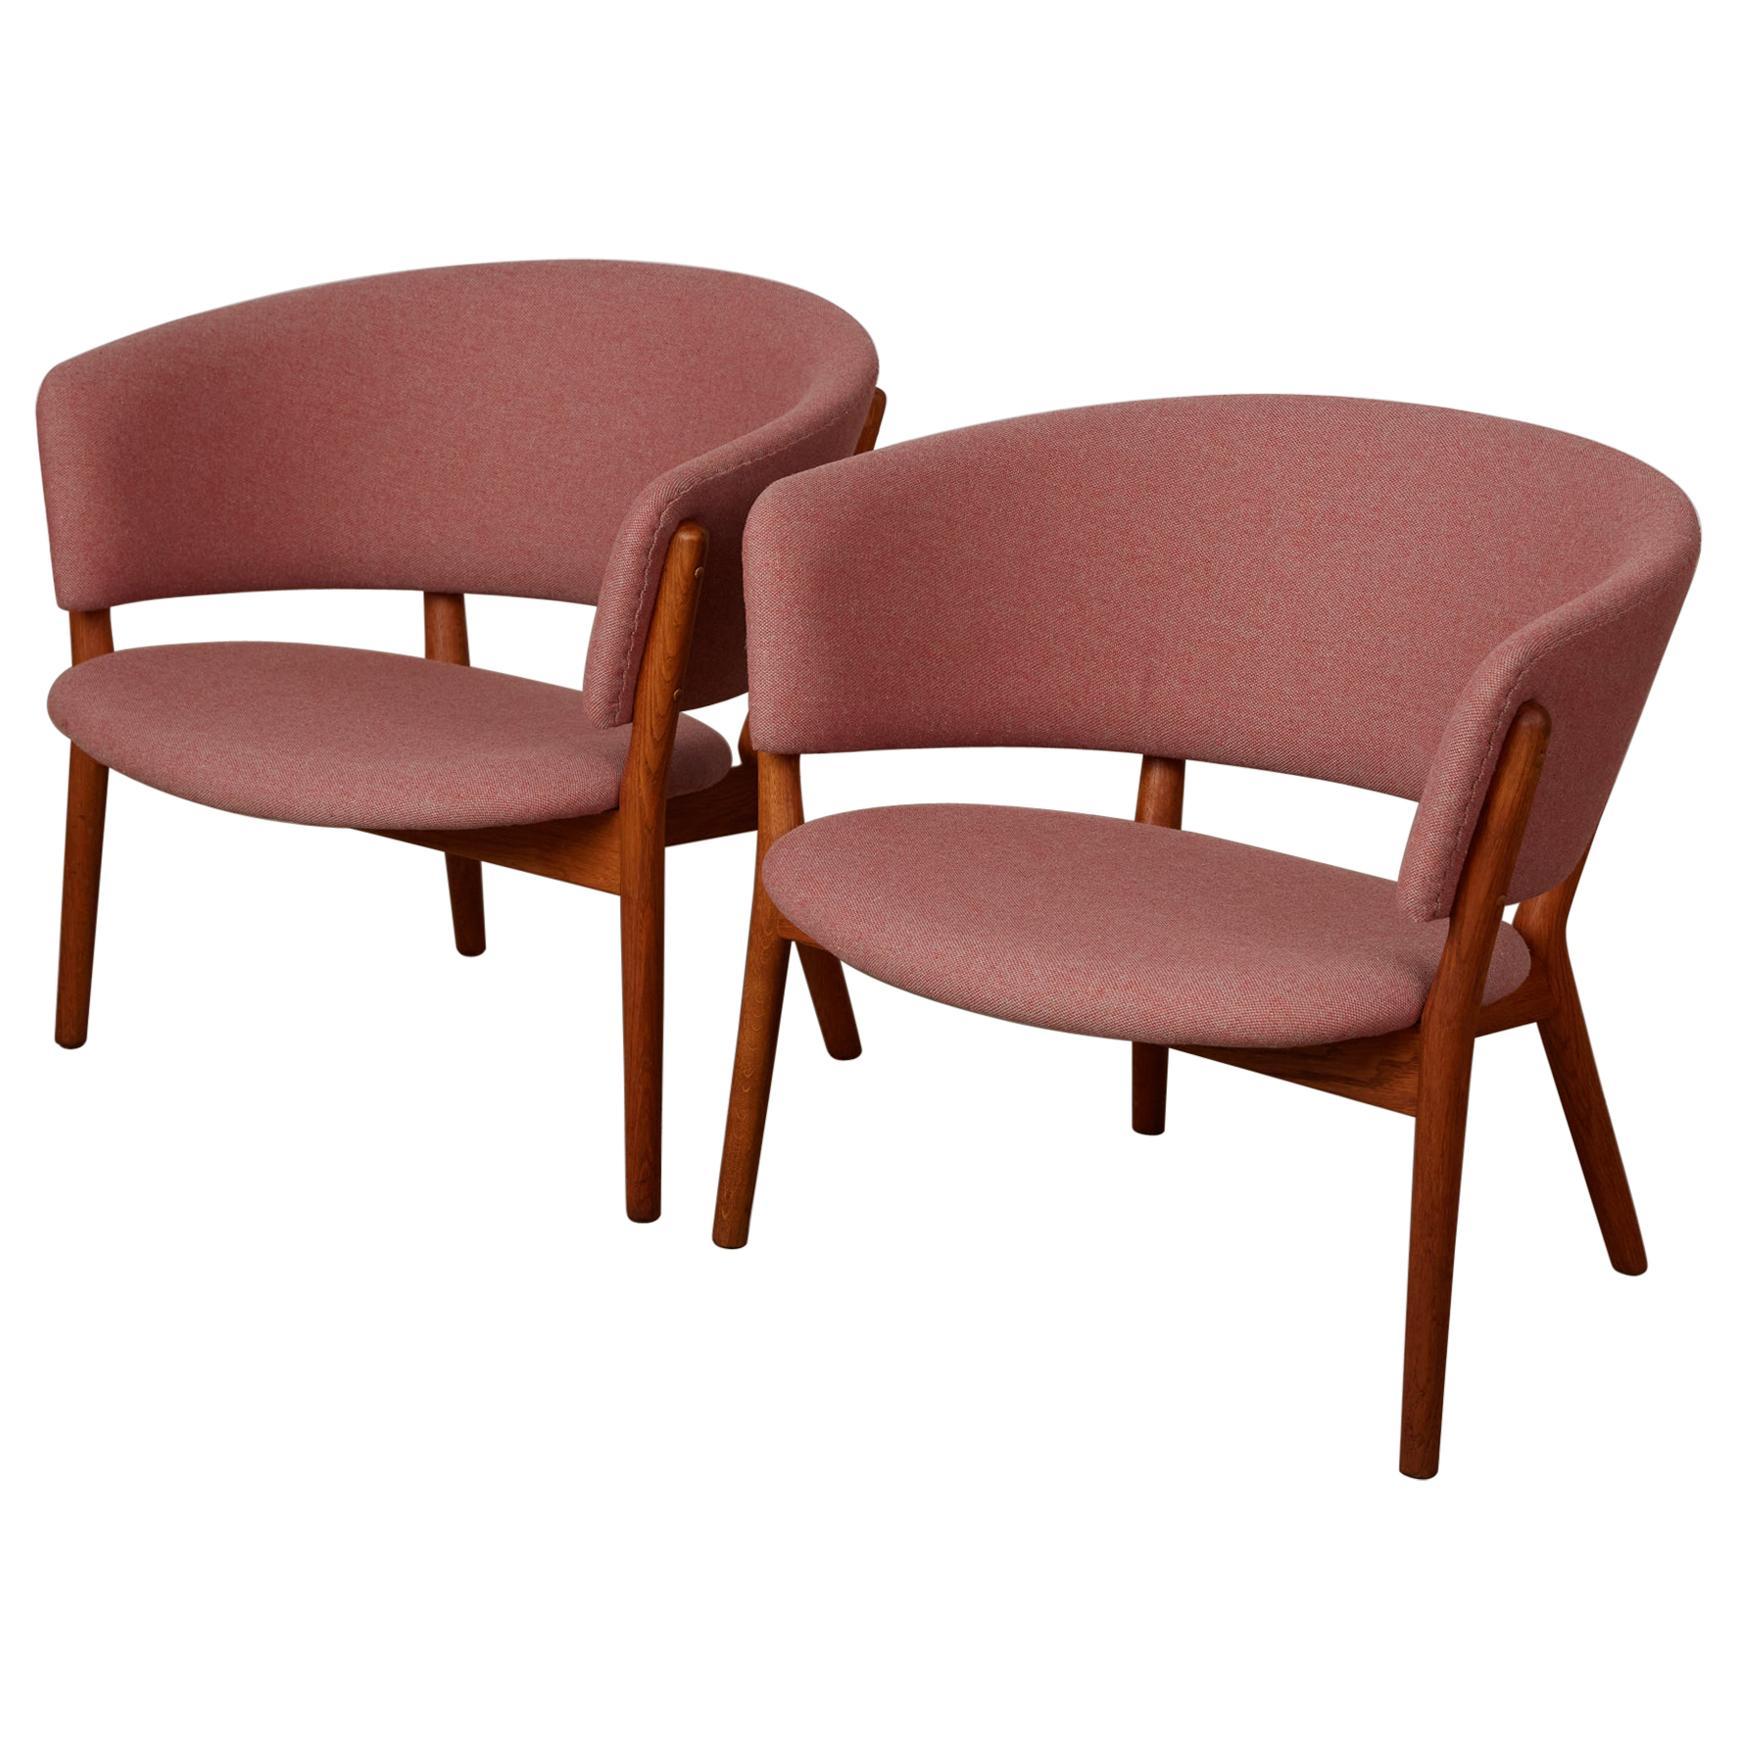 Pair of Nanna Ditzel ND83 Lounge Chairs for Søren Willadsen